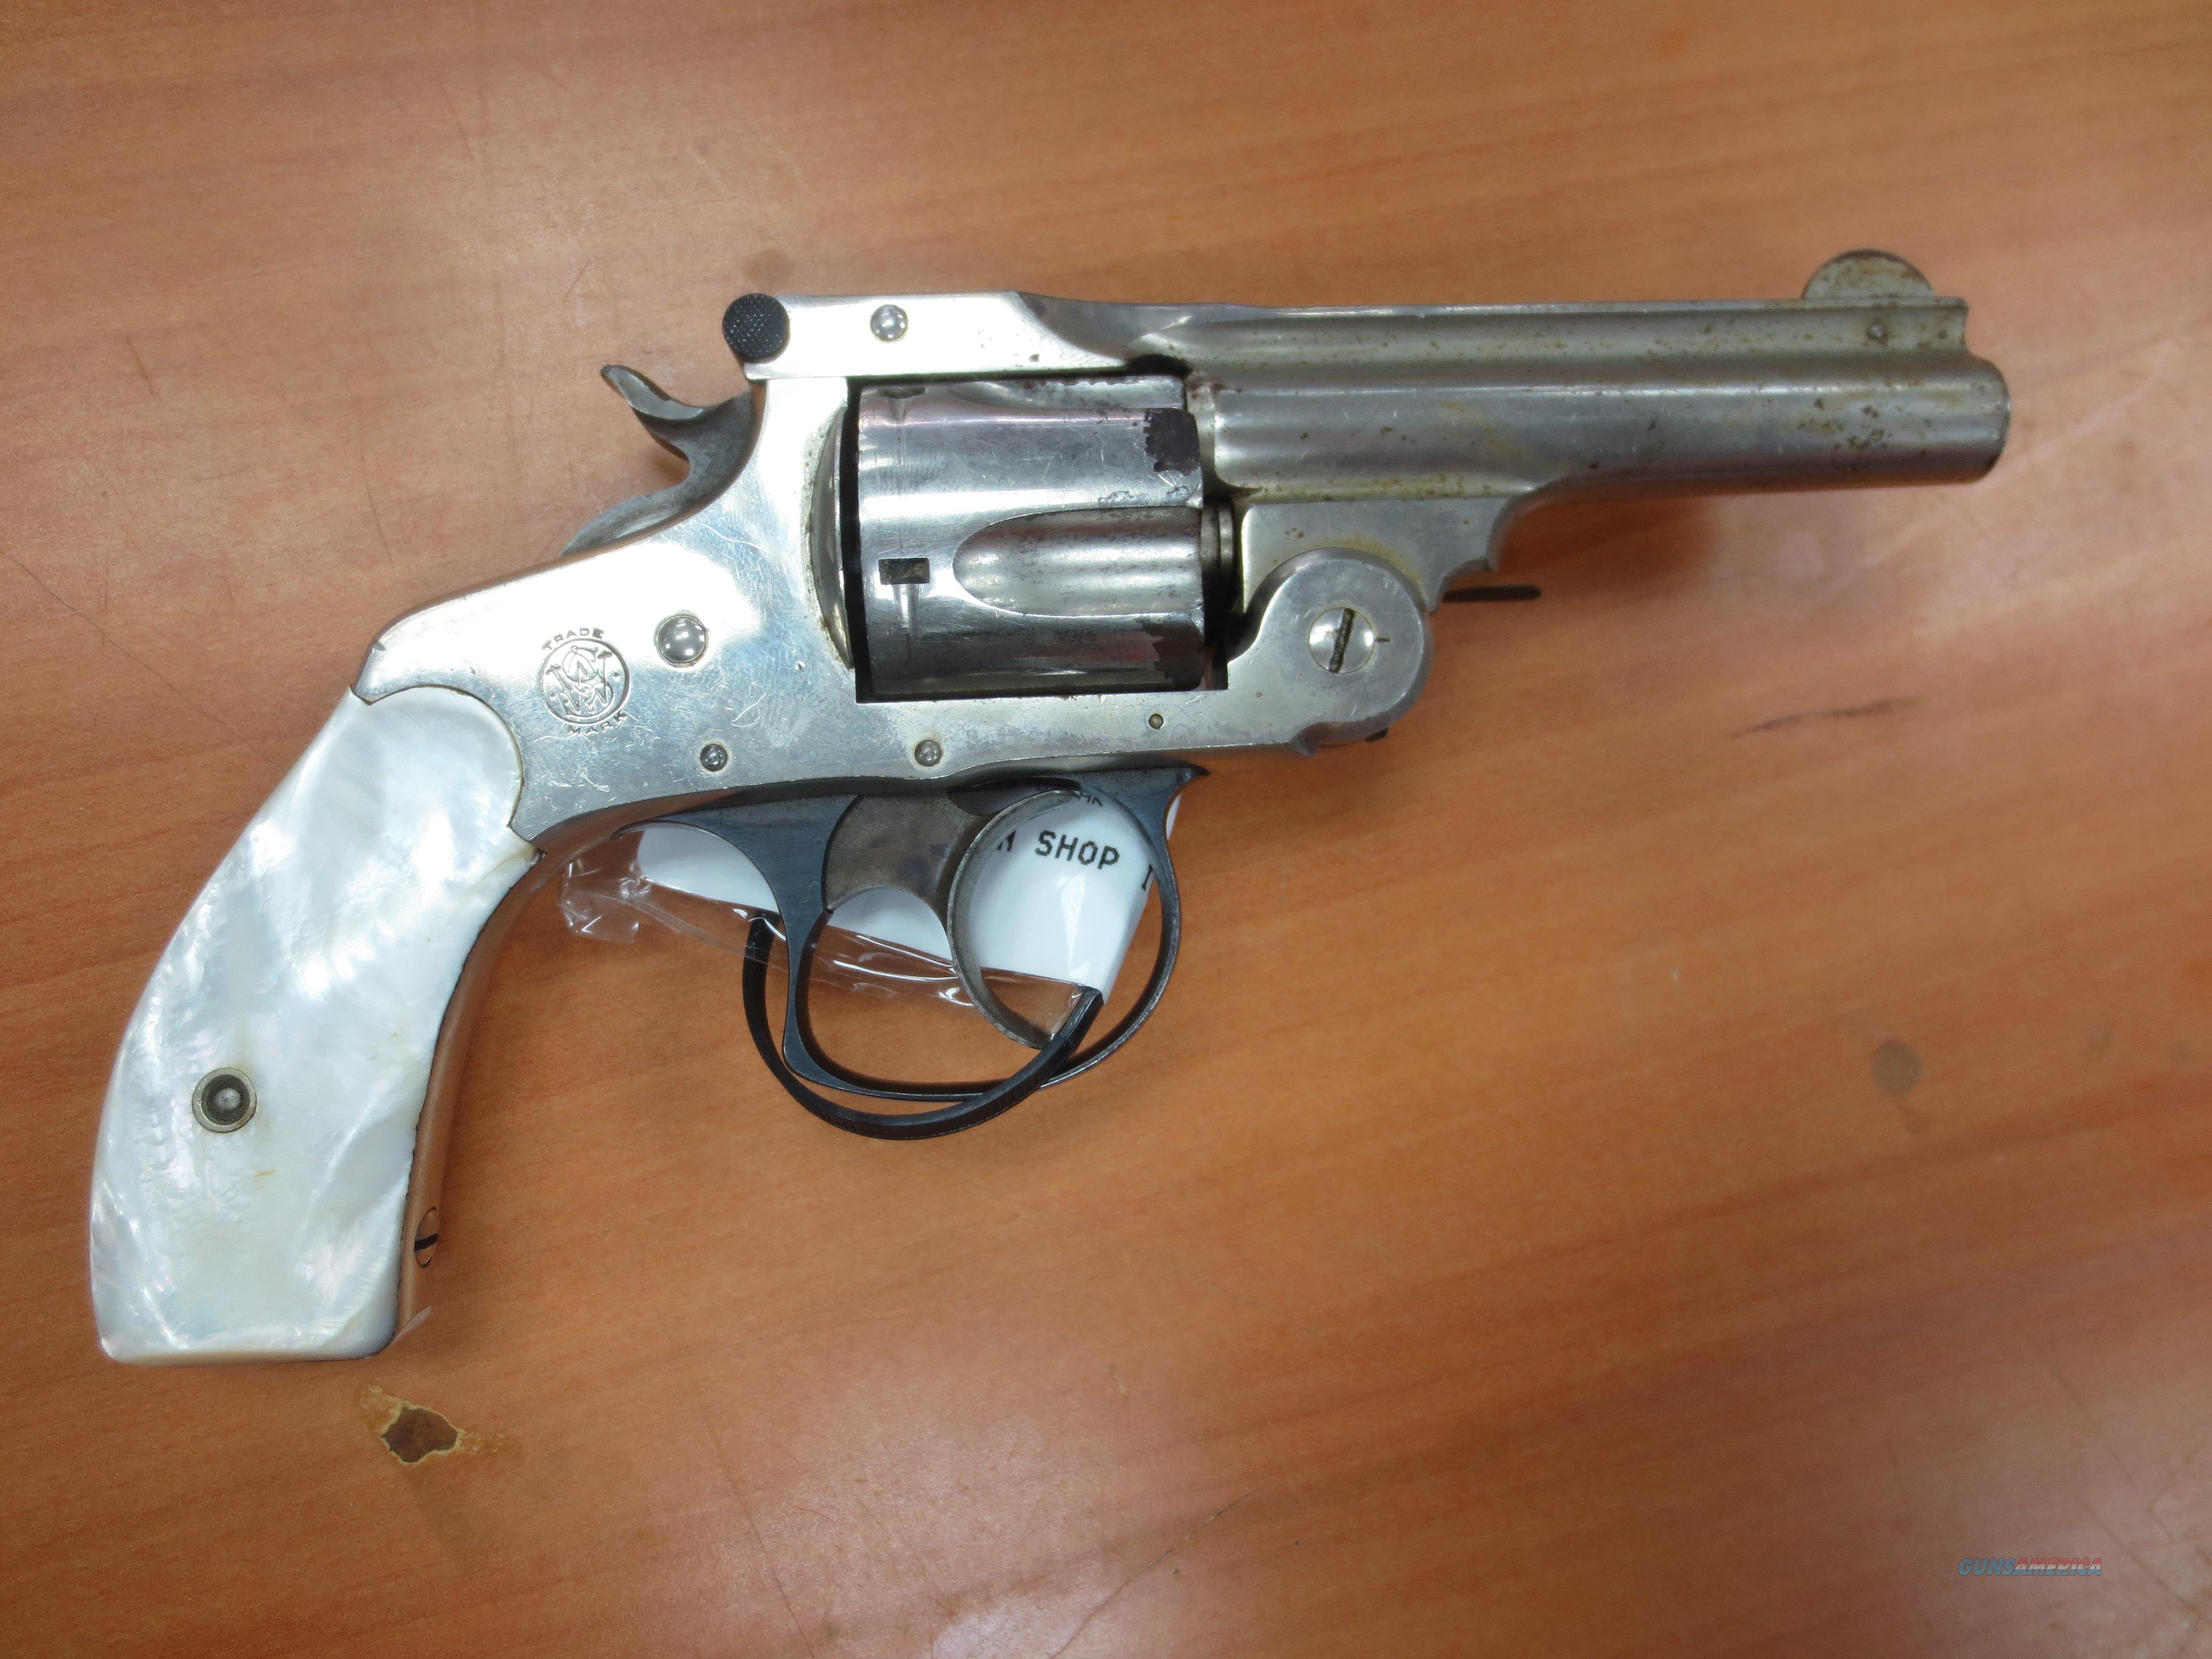 S&W mod# Topbreak 5 shot revolver w/ faux pearl grips & case colored trigger & hammer   Guns > Pistols > Smith & Wesson Revolvers > Pre-1945